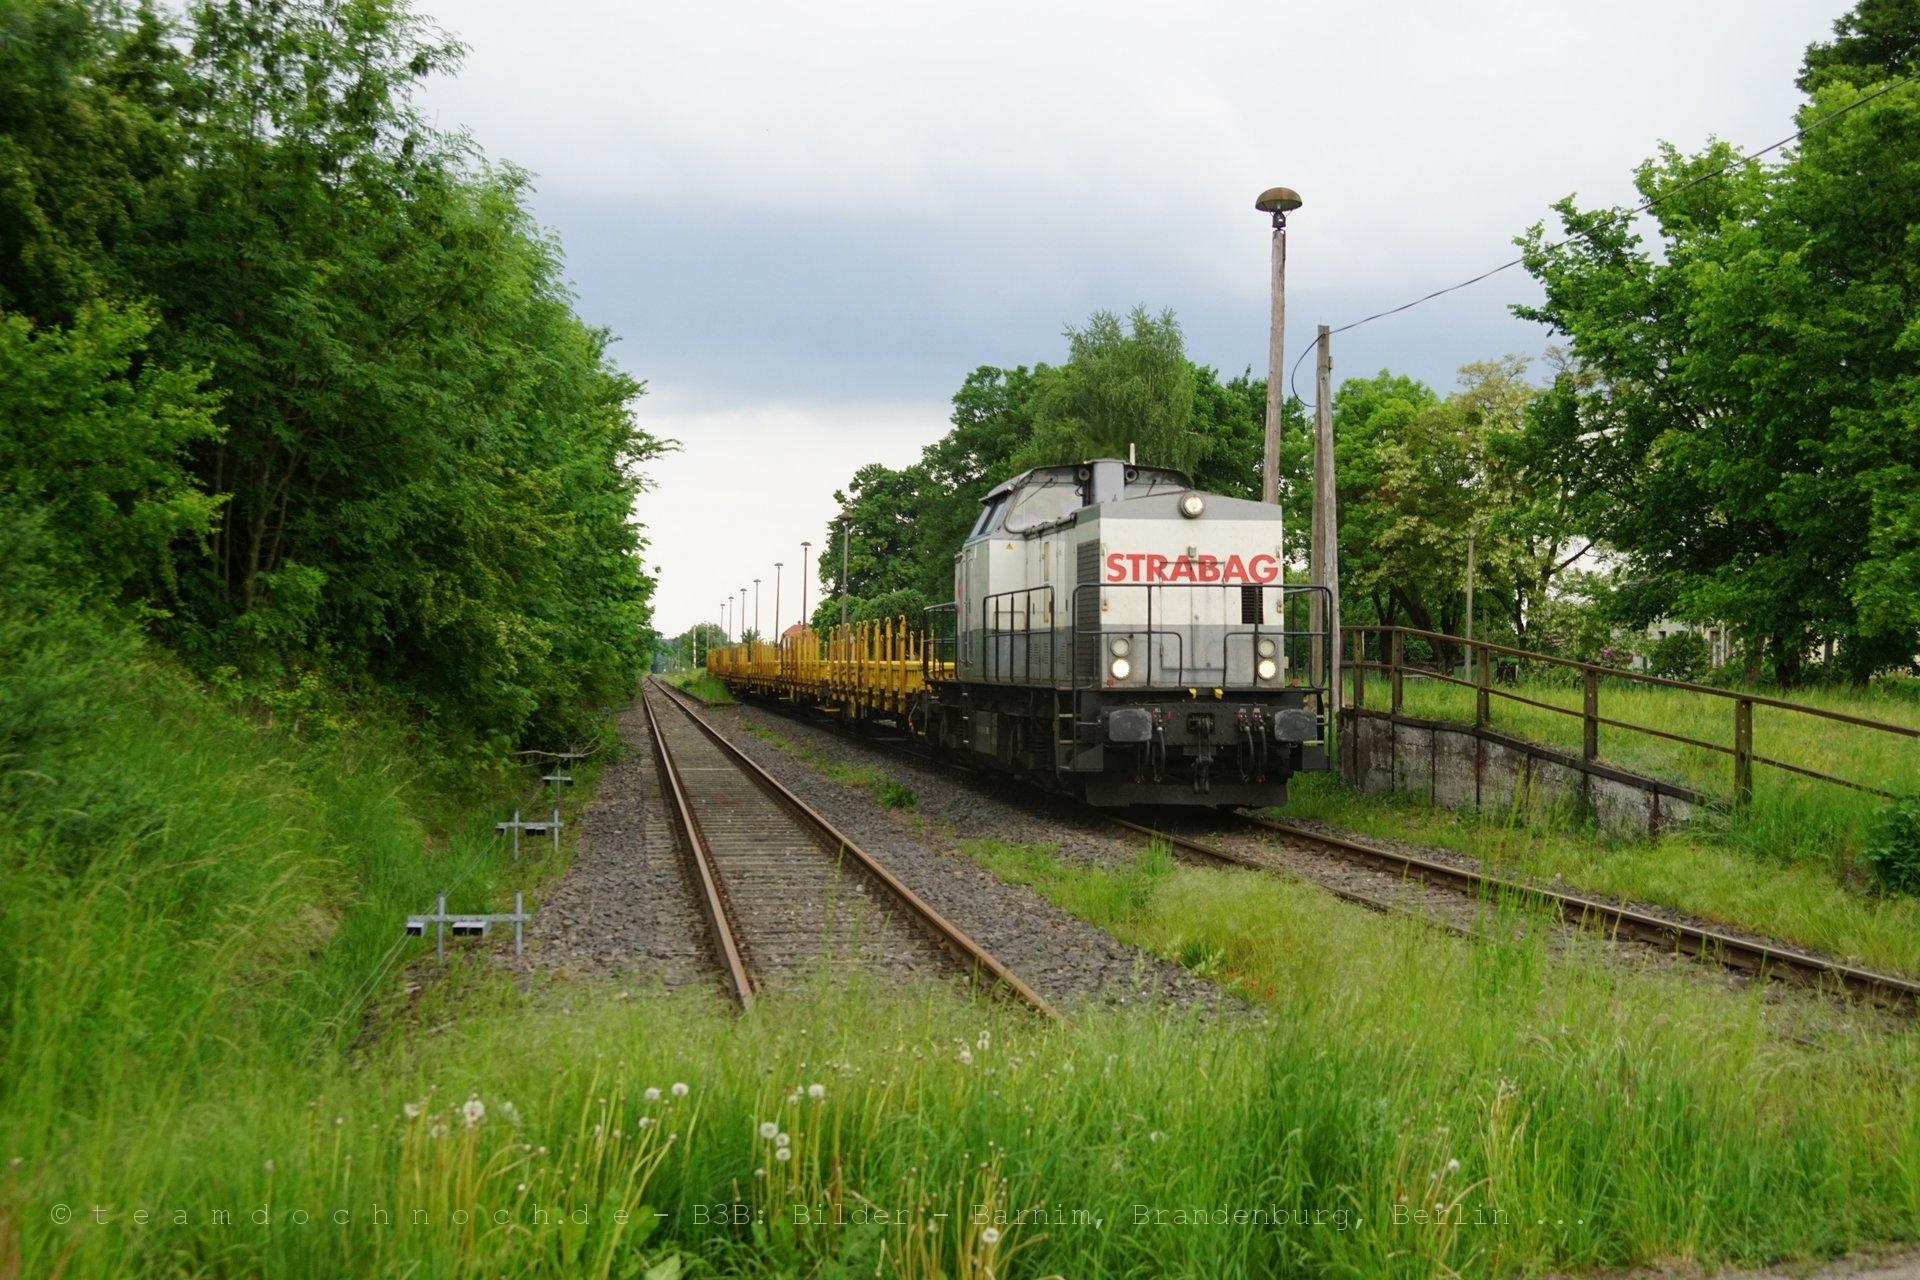 STRABAG V100 in Friedrichswalde